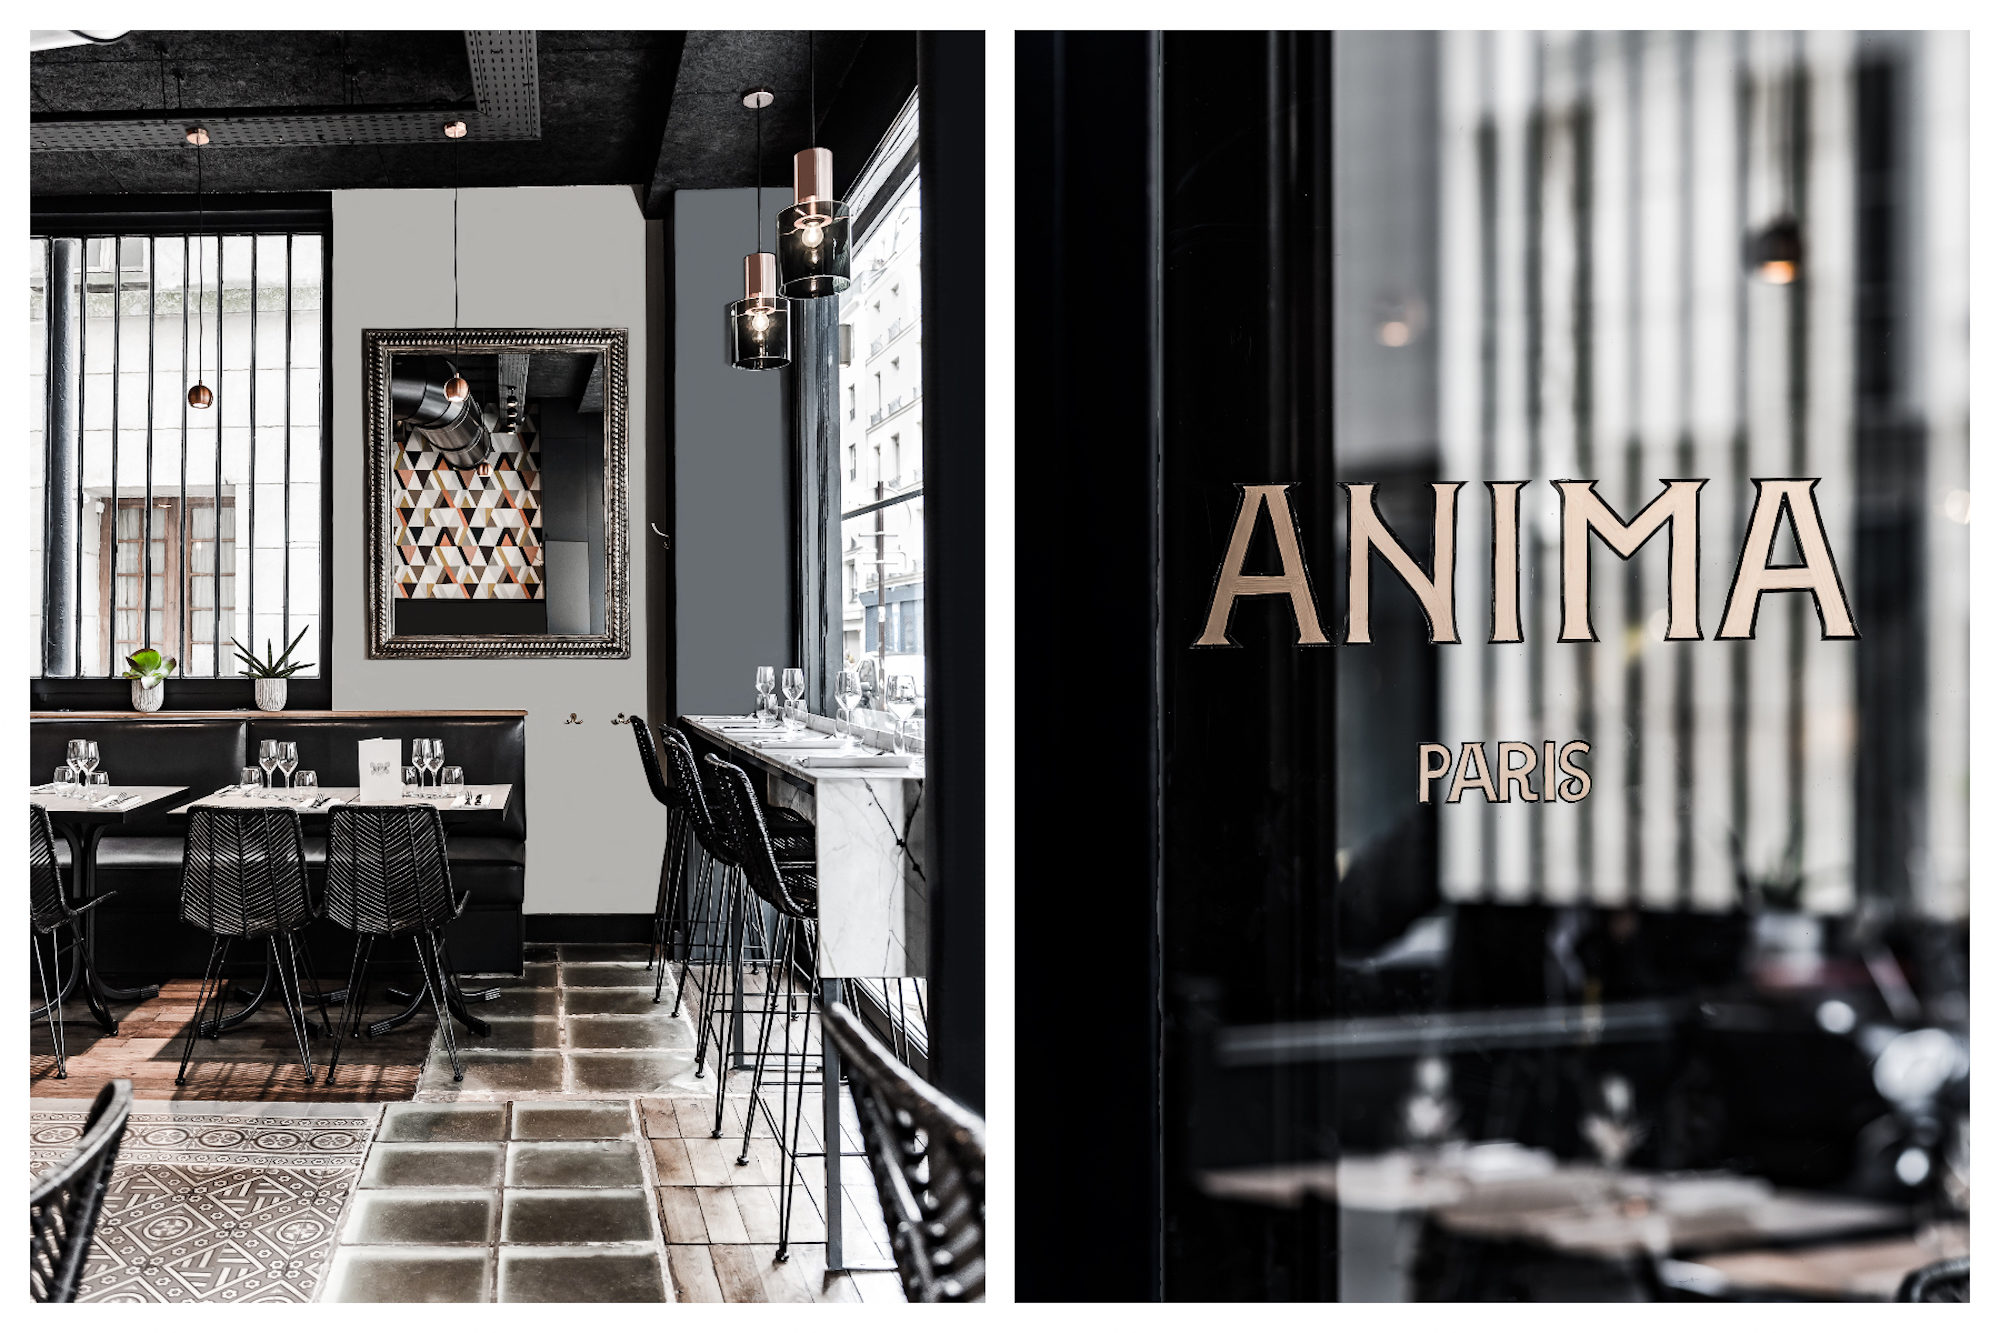 The subdued slate gray decor of Anima restaurant on rue du Cherche-Midi (left). The window of Anima restaurant in Paris (right).